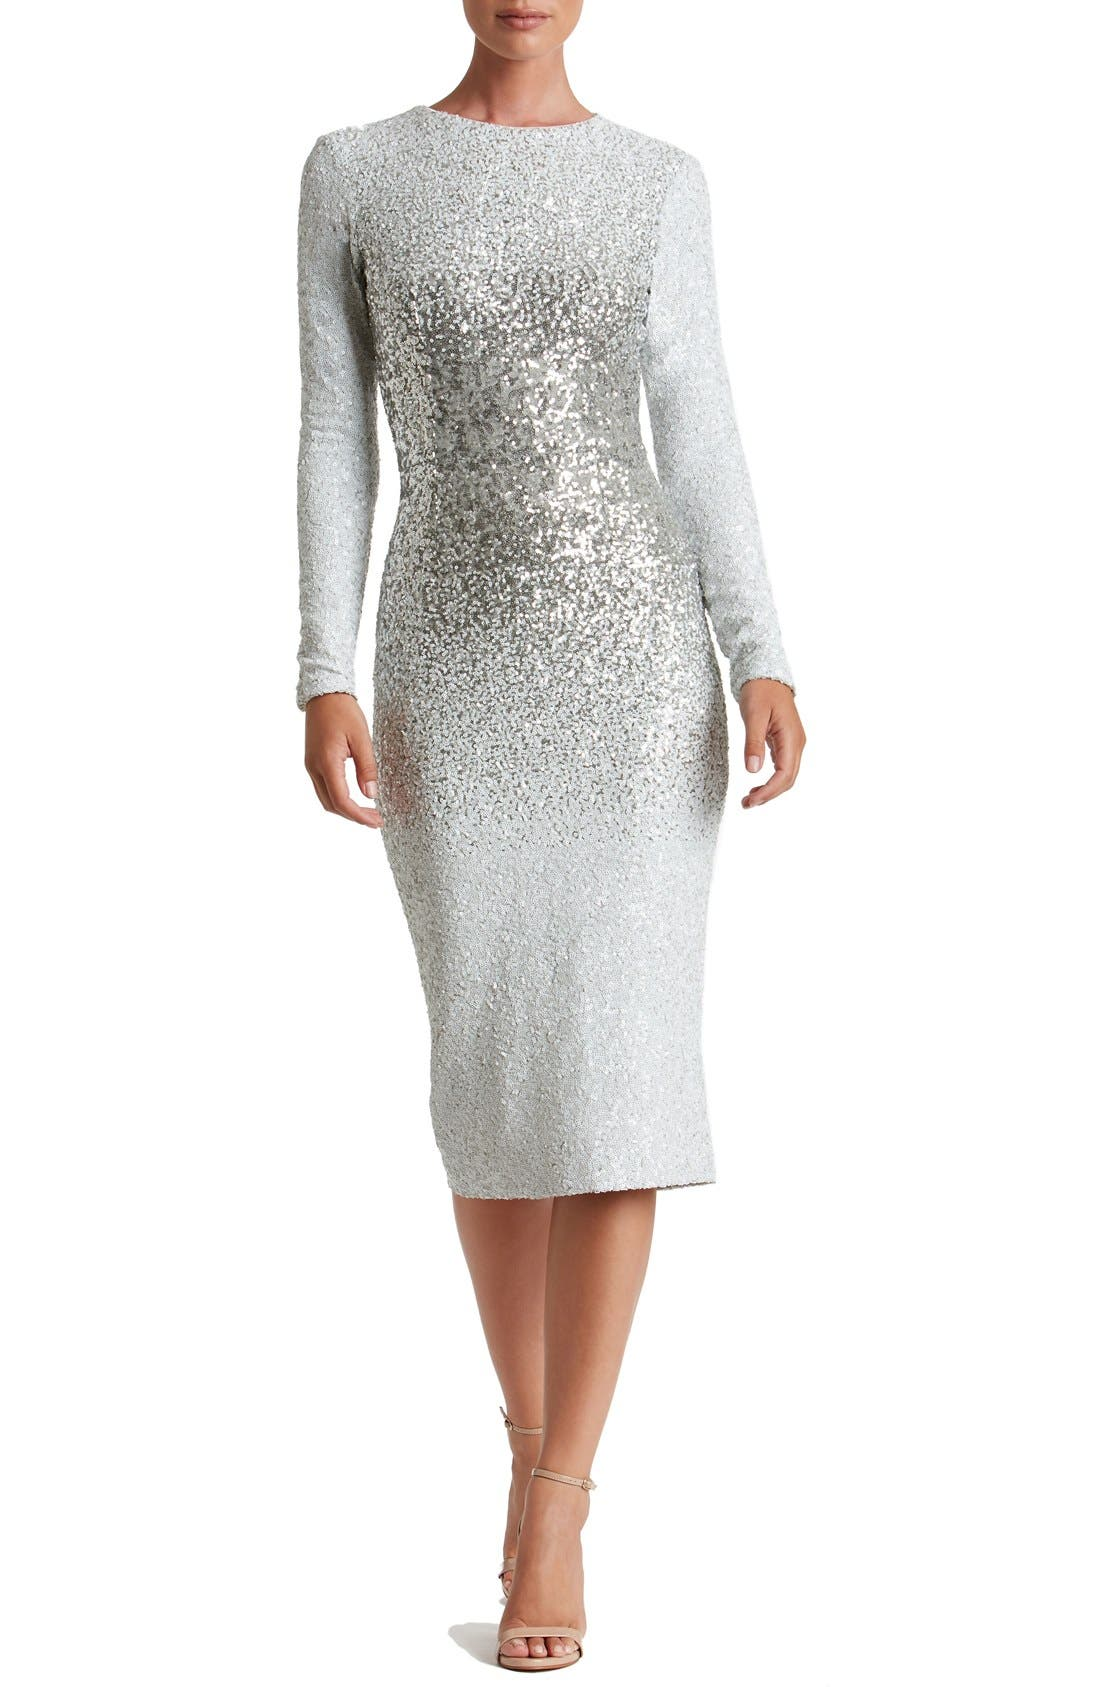 Alternate Image 1 Selected - Dress the Population Brooke Sequin Midi Dress